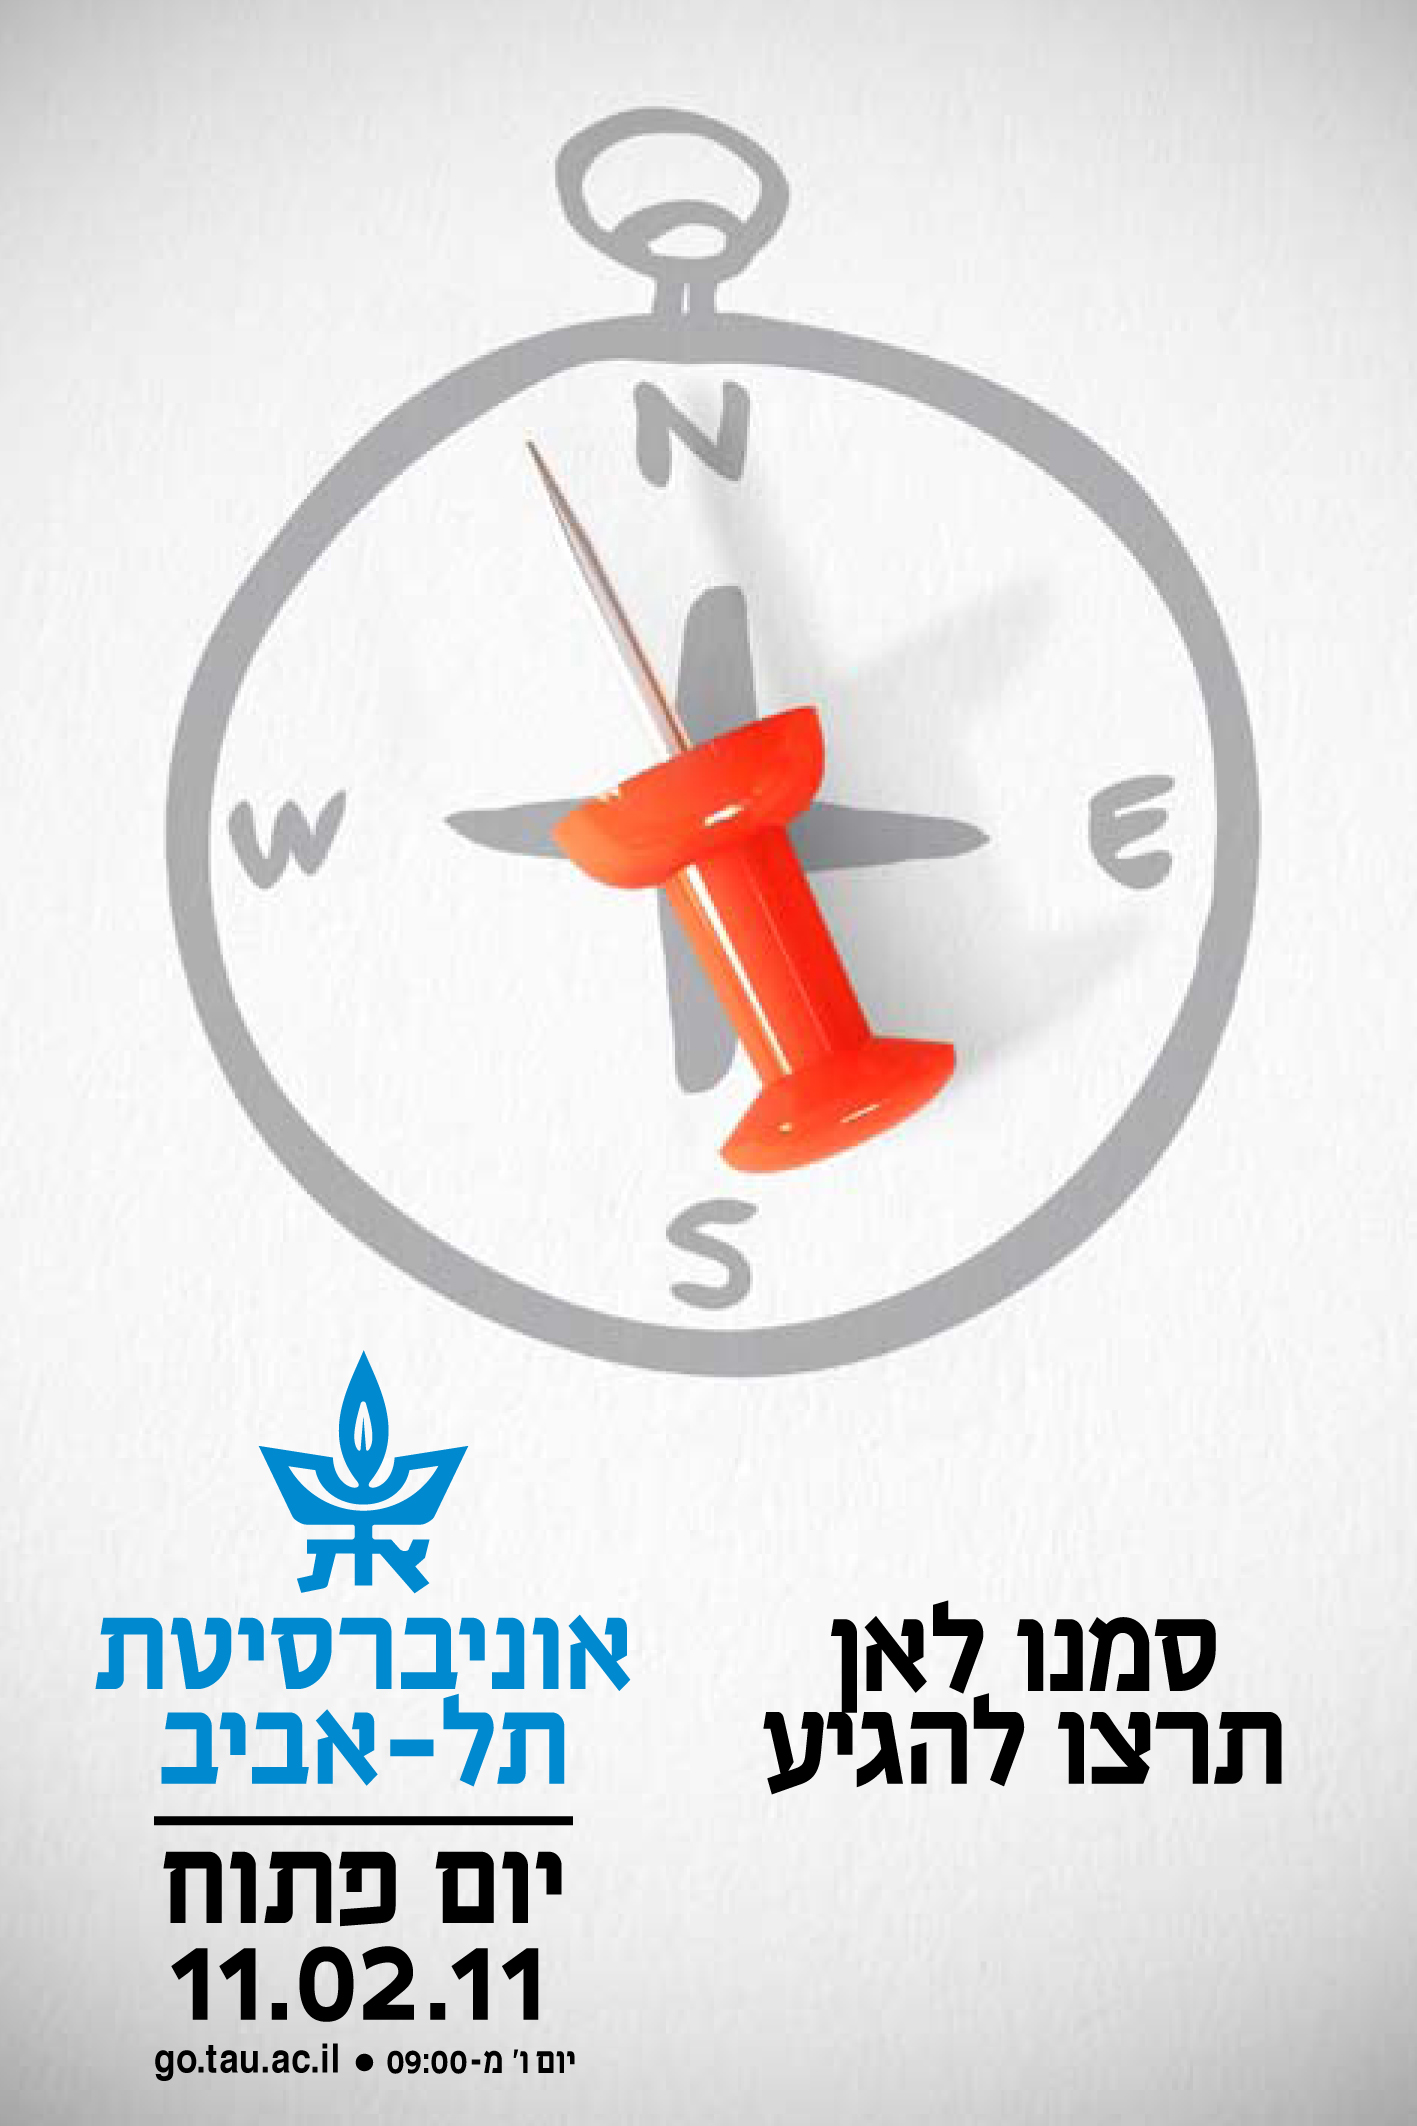 לין & לין - אוניברסיטת תל אביב